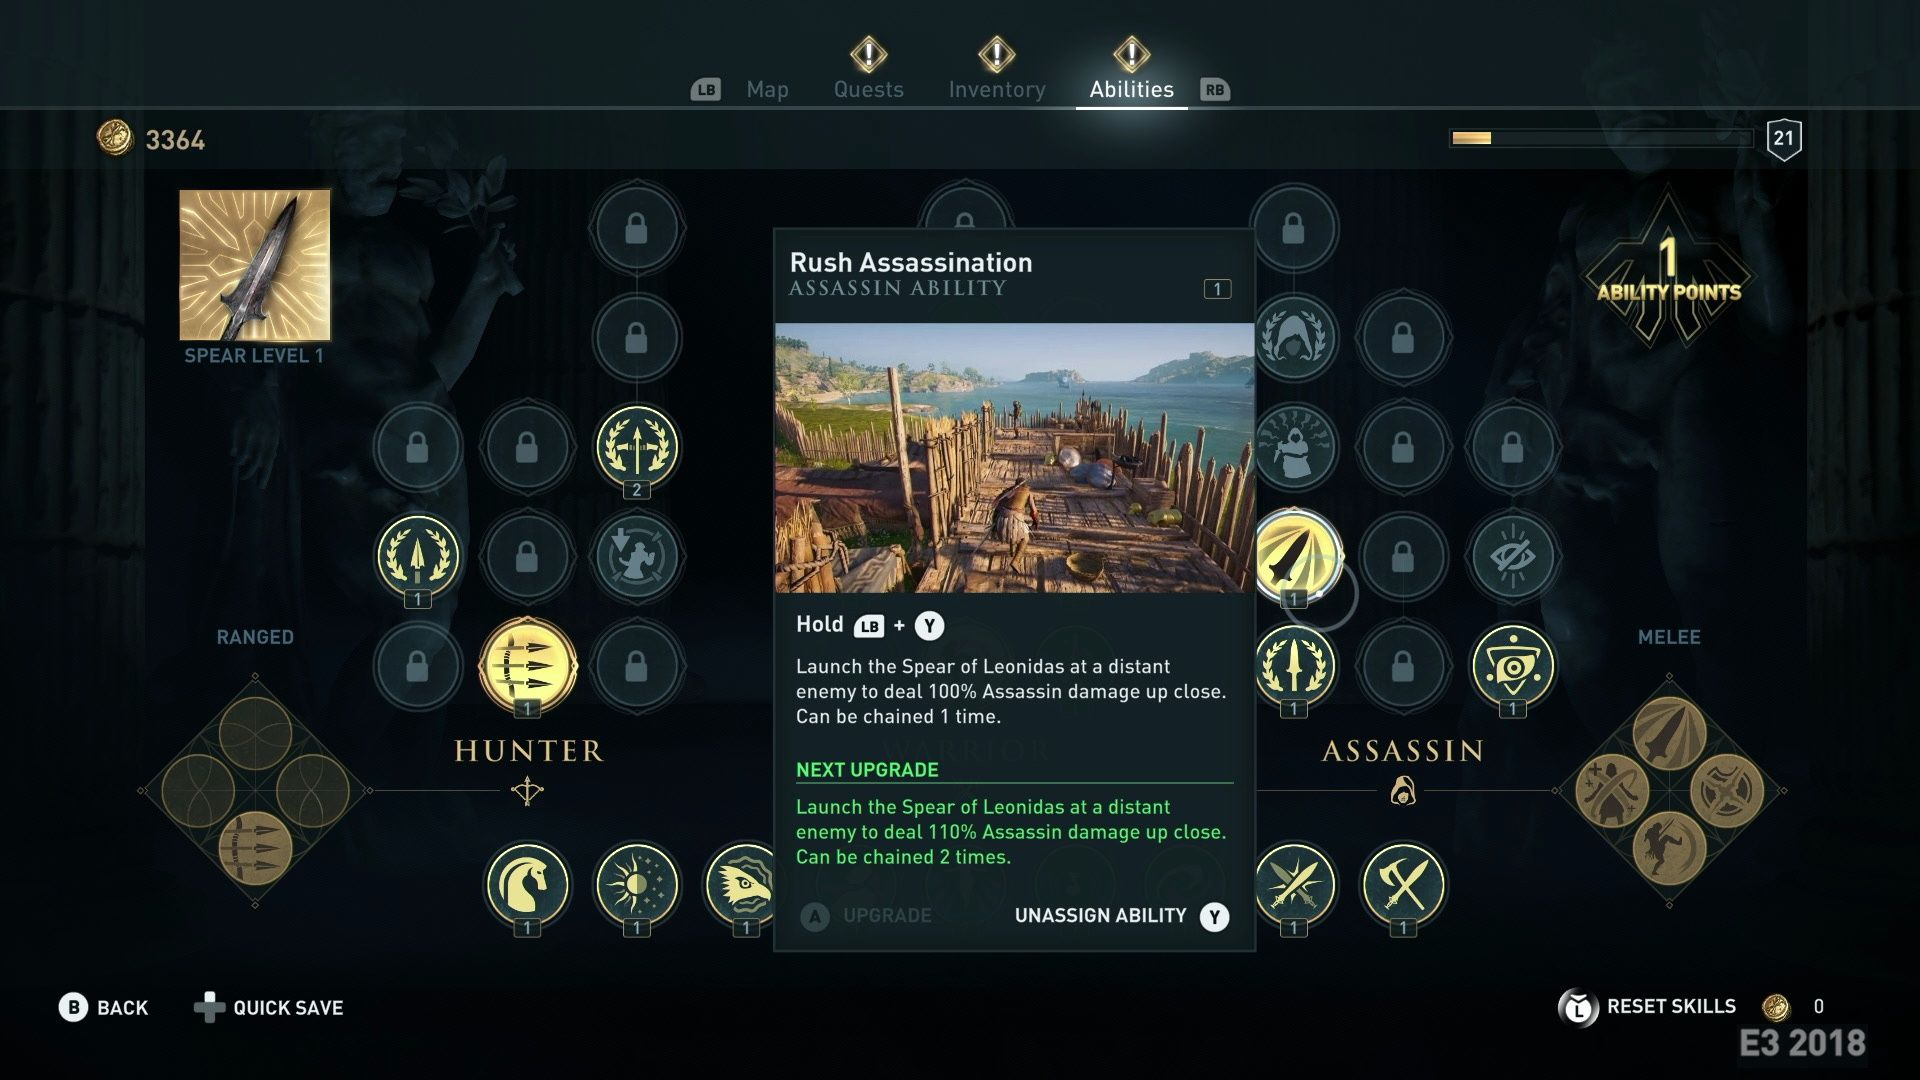 Assassin's creed odyssey screenshots